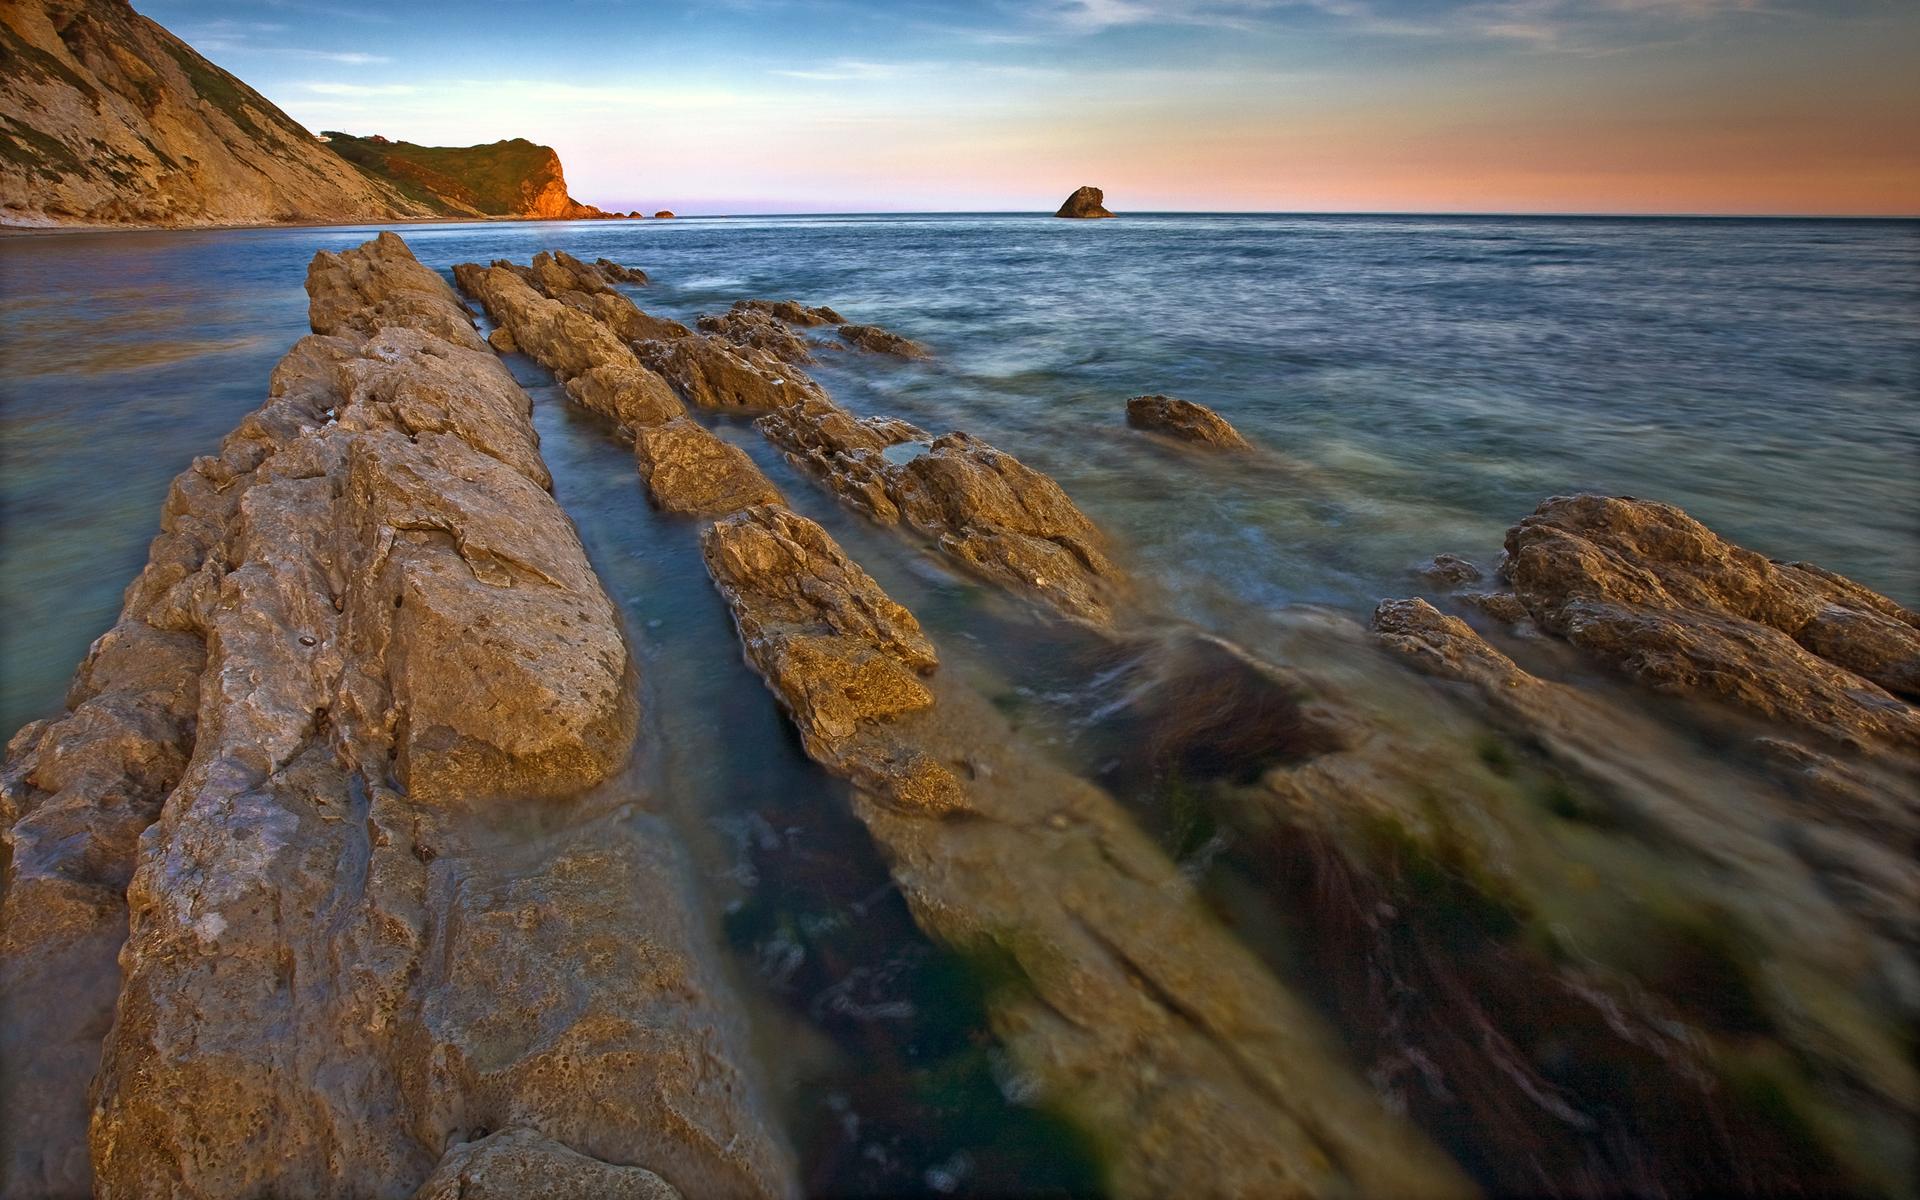 Mar con Rocas